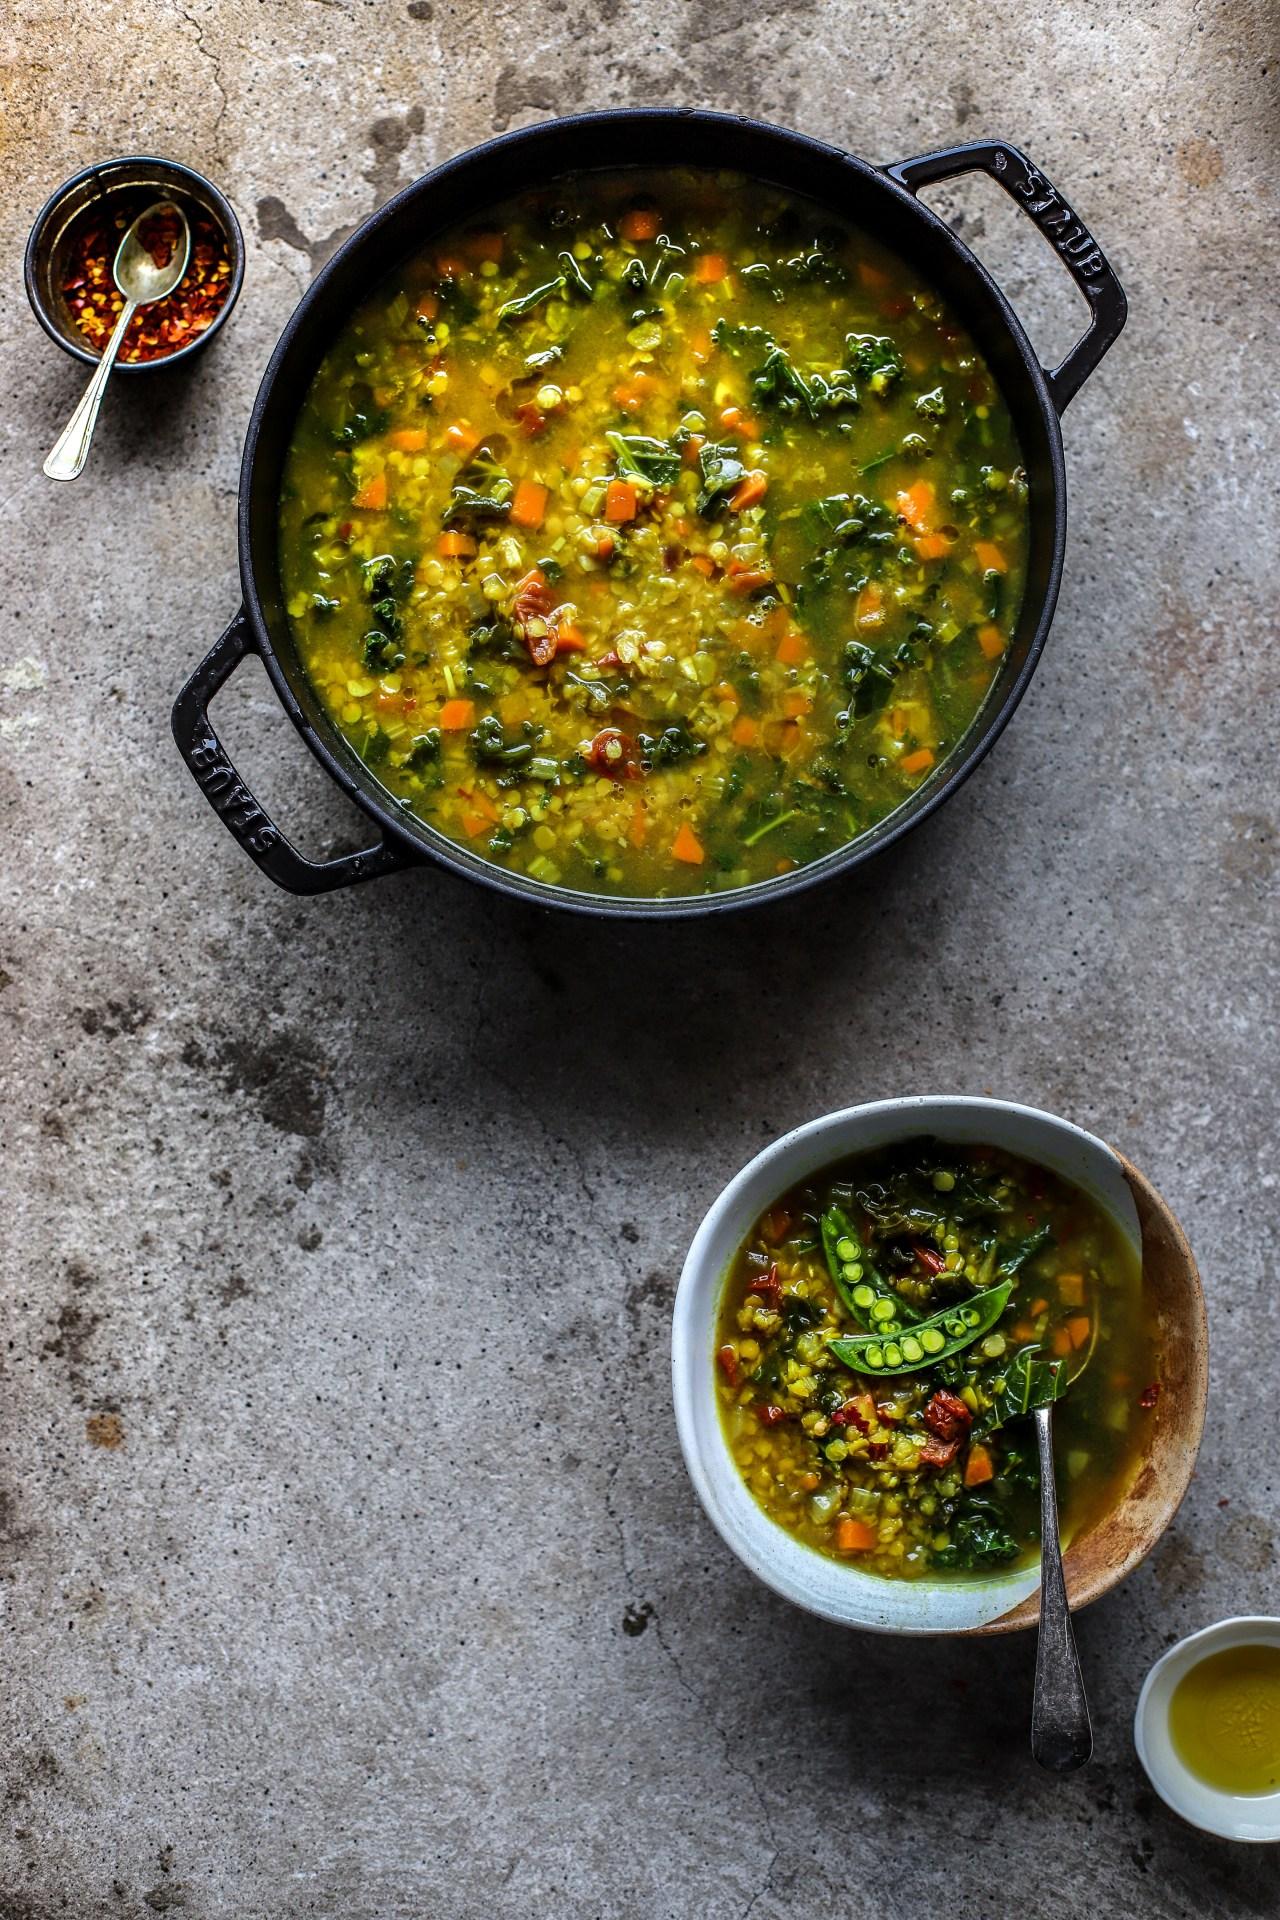 #Mediterranean #Lentil, #Turmeric and Lemon Broth - #antiinflammatorydiet #soup #vegetables #recipe